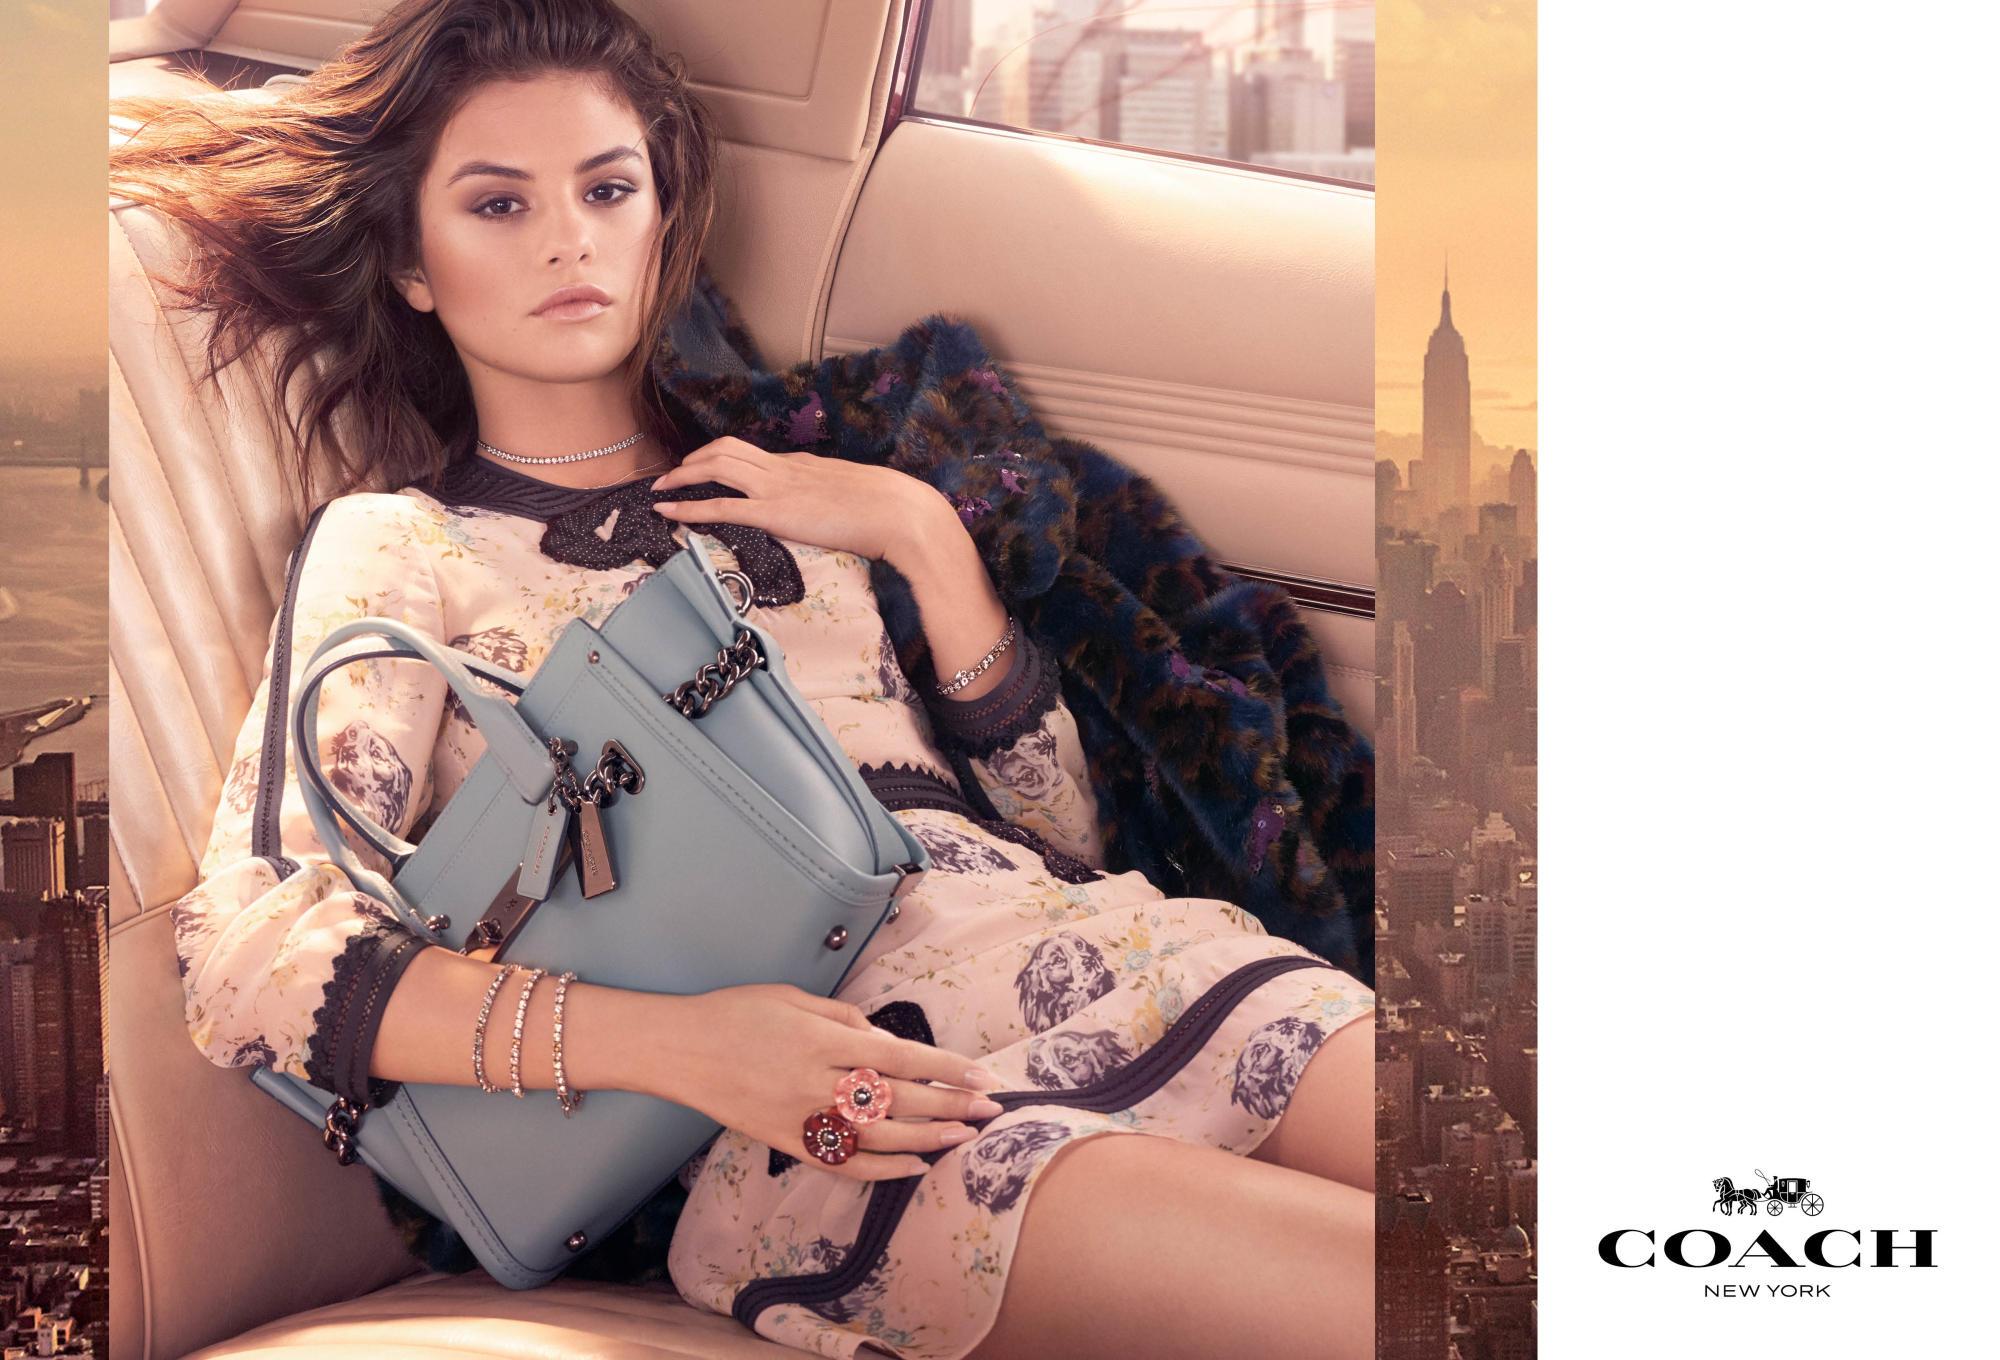 Mόλις κυκλοφόρησε η πρώτη καμπάνια της Selena Gomez για την Coach